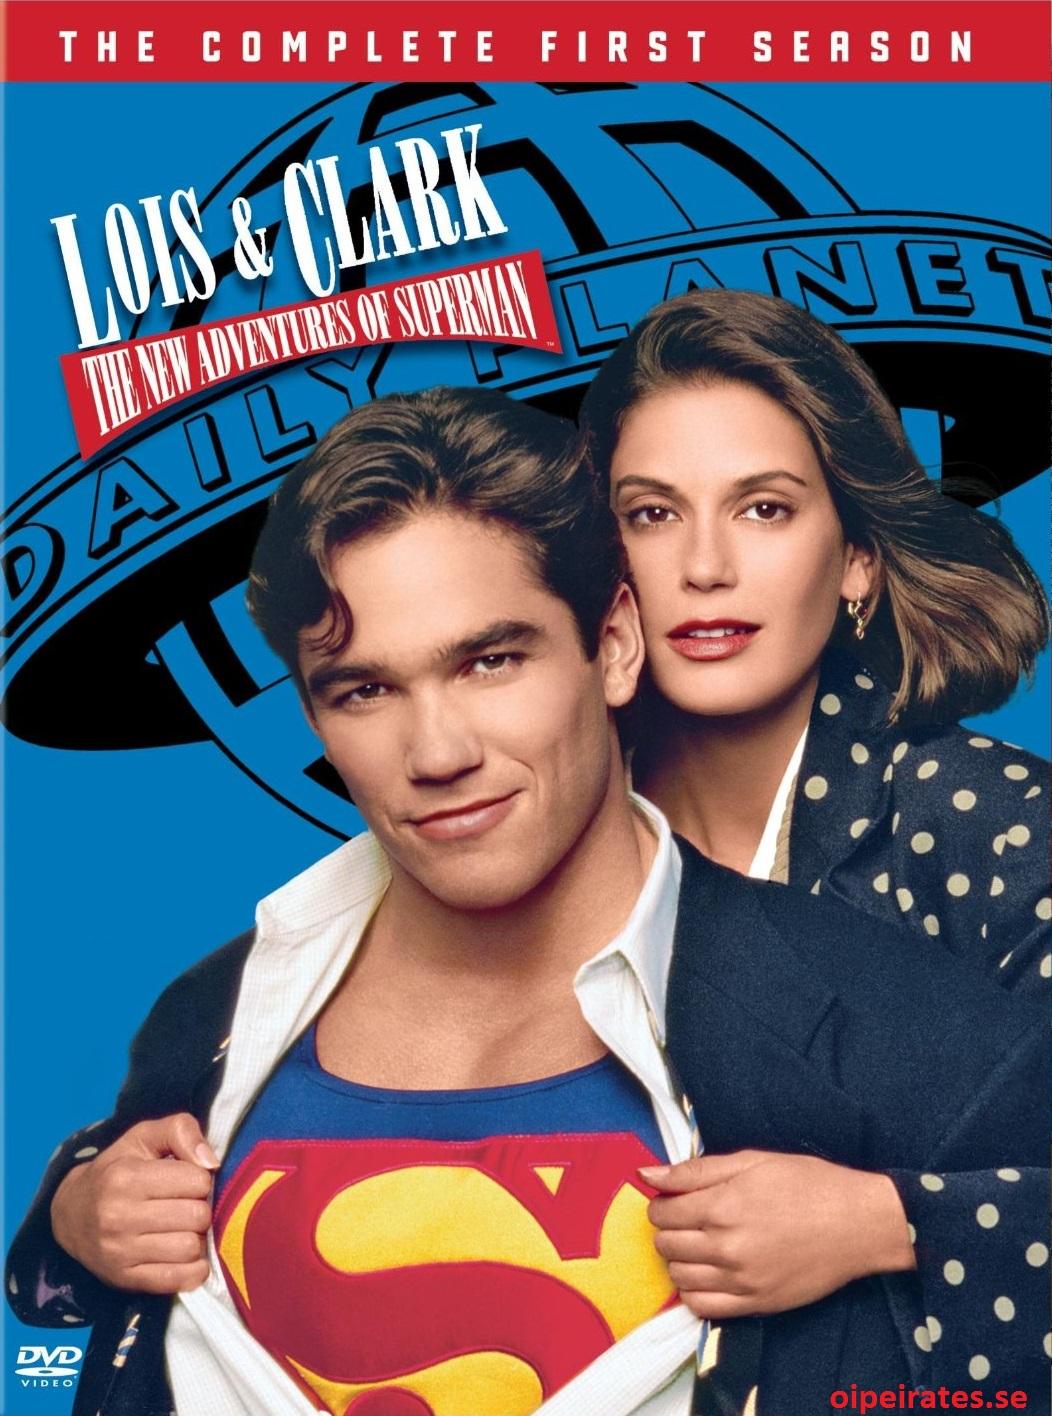 Lois & Clark: The New Adventures of Superman (1993) ταινιες online seires xrysoi greek subs